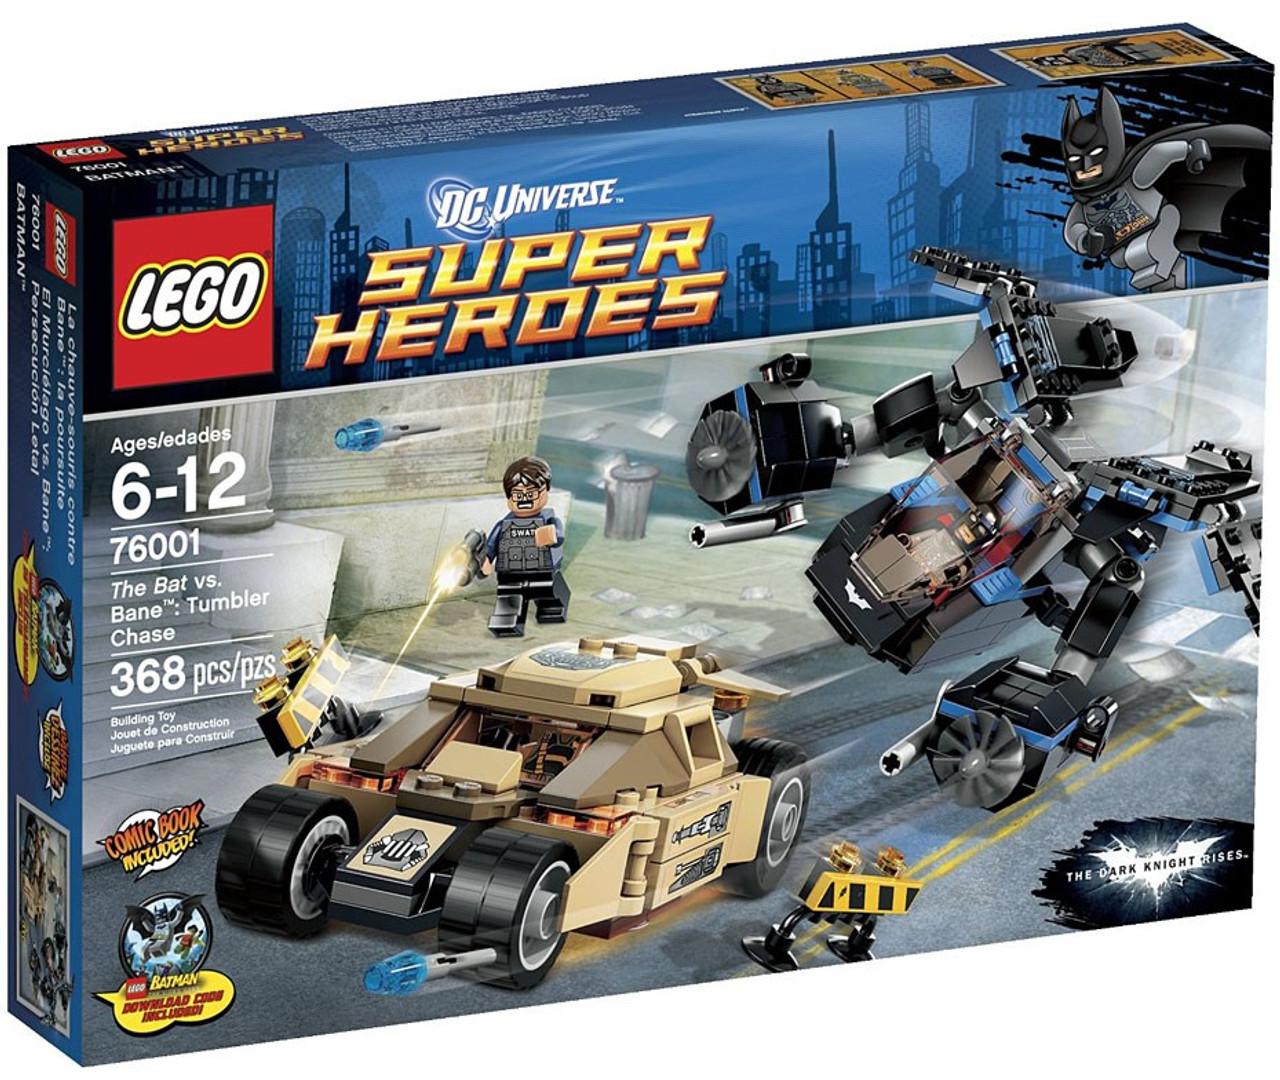 Lego Dc Universe Super Heroes The Bat Vs Bane Tumbler Chase Set